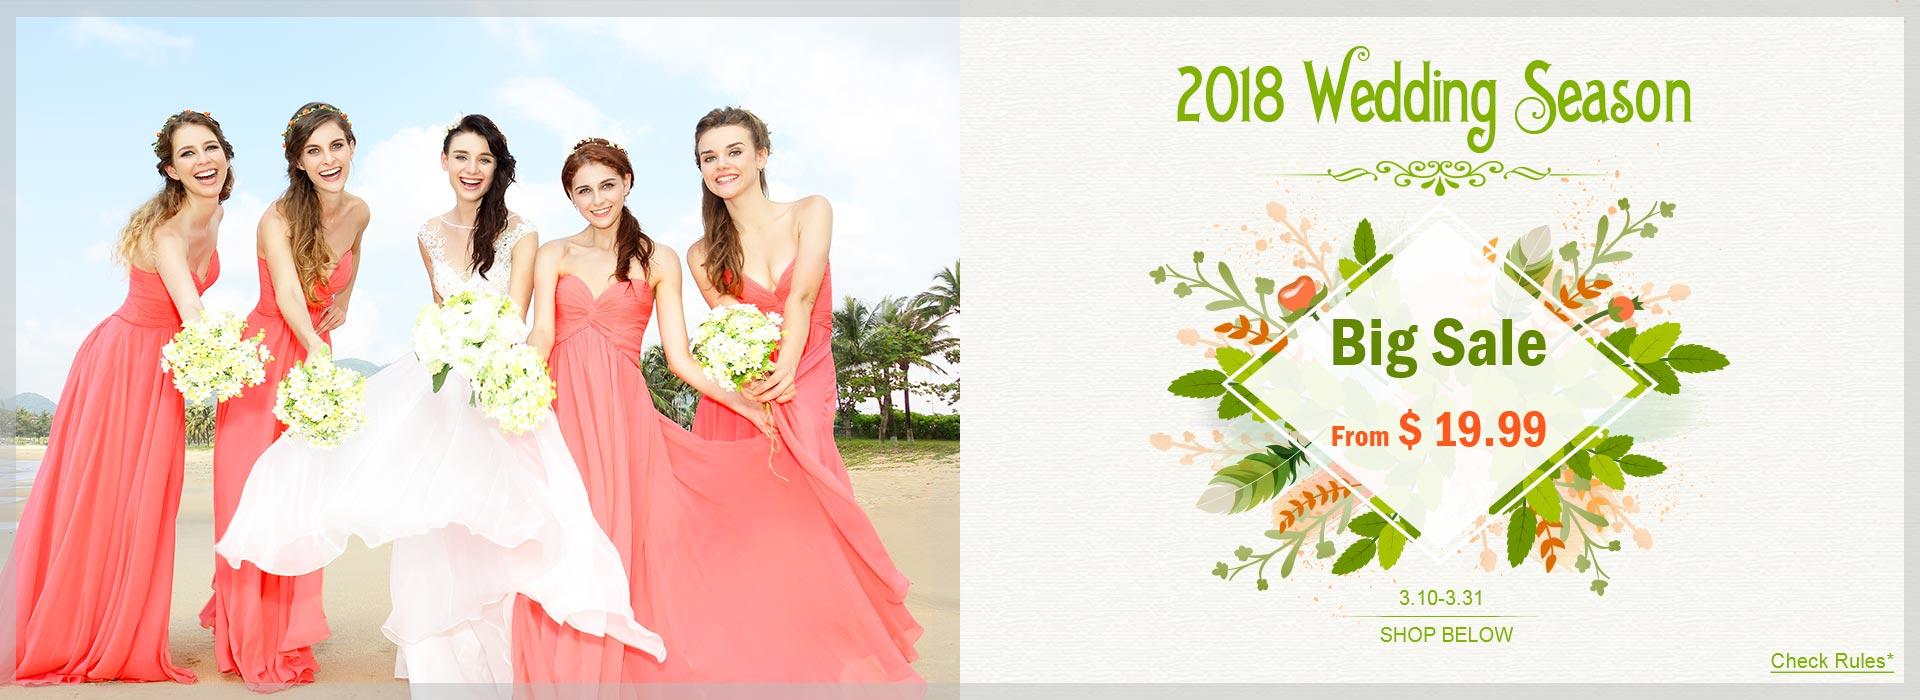 Wedding season sale 2018